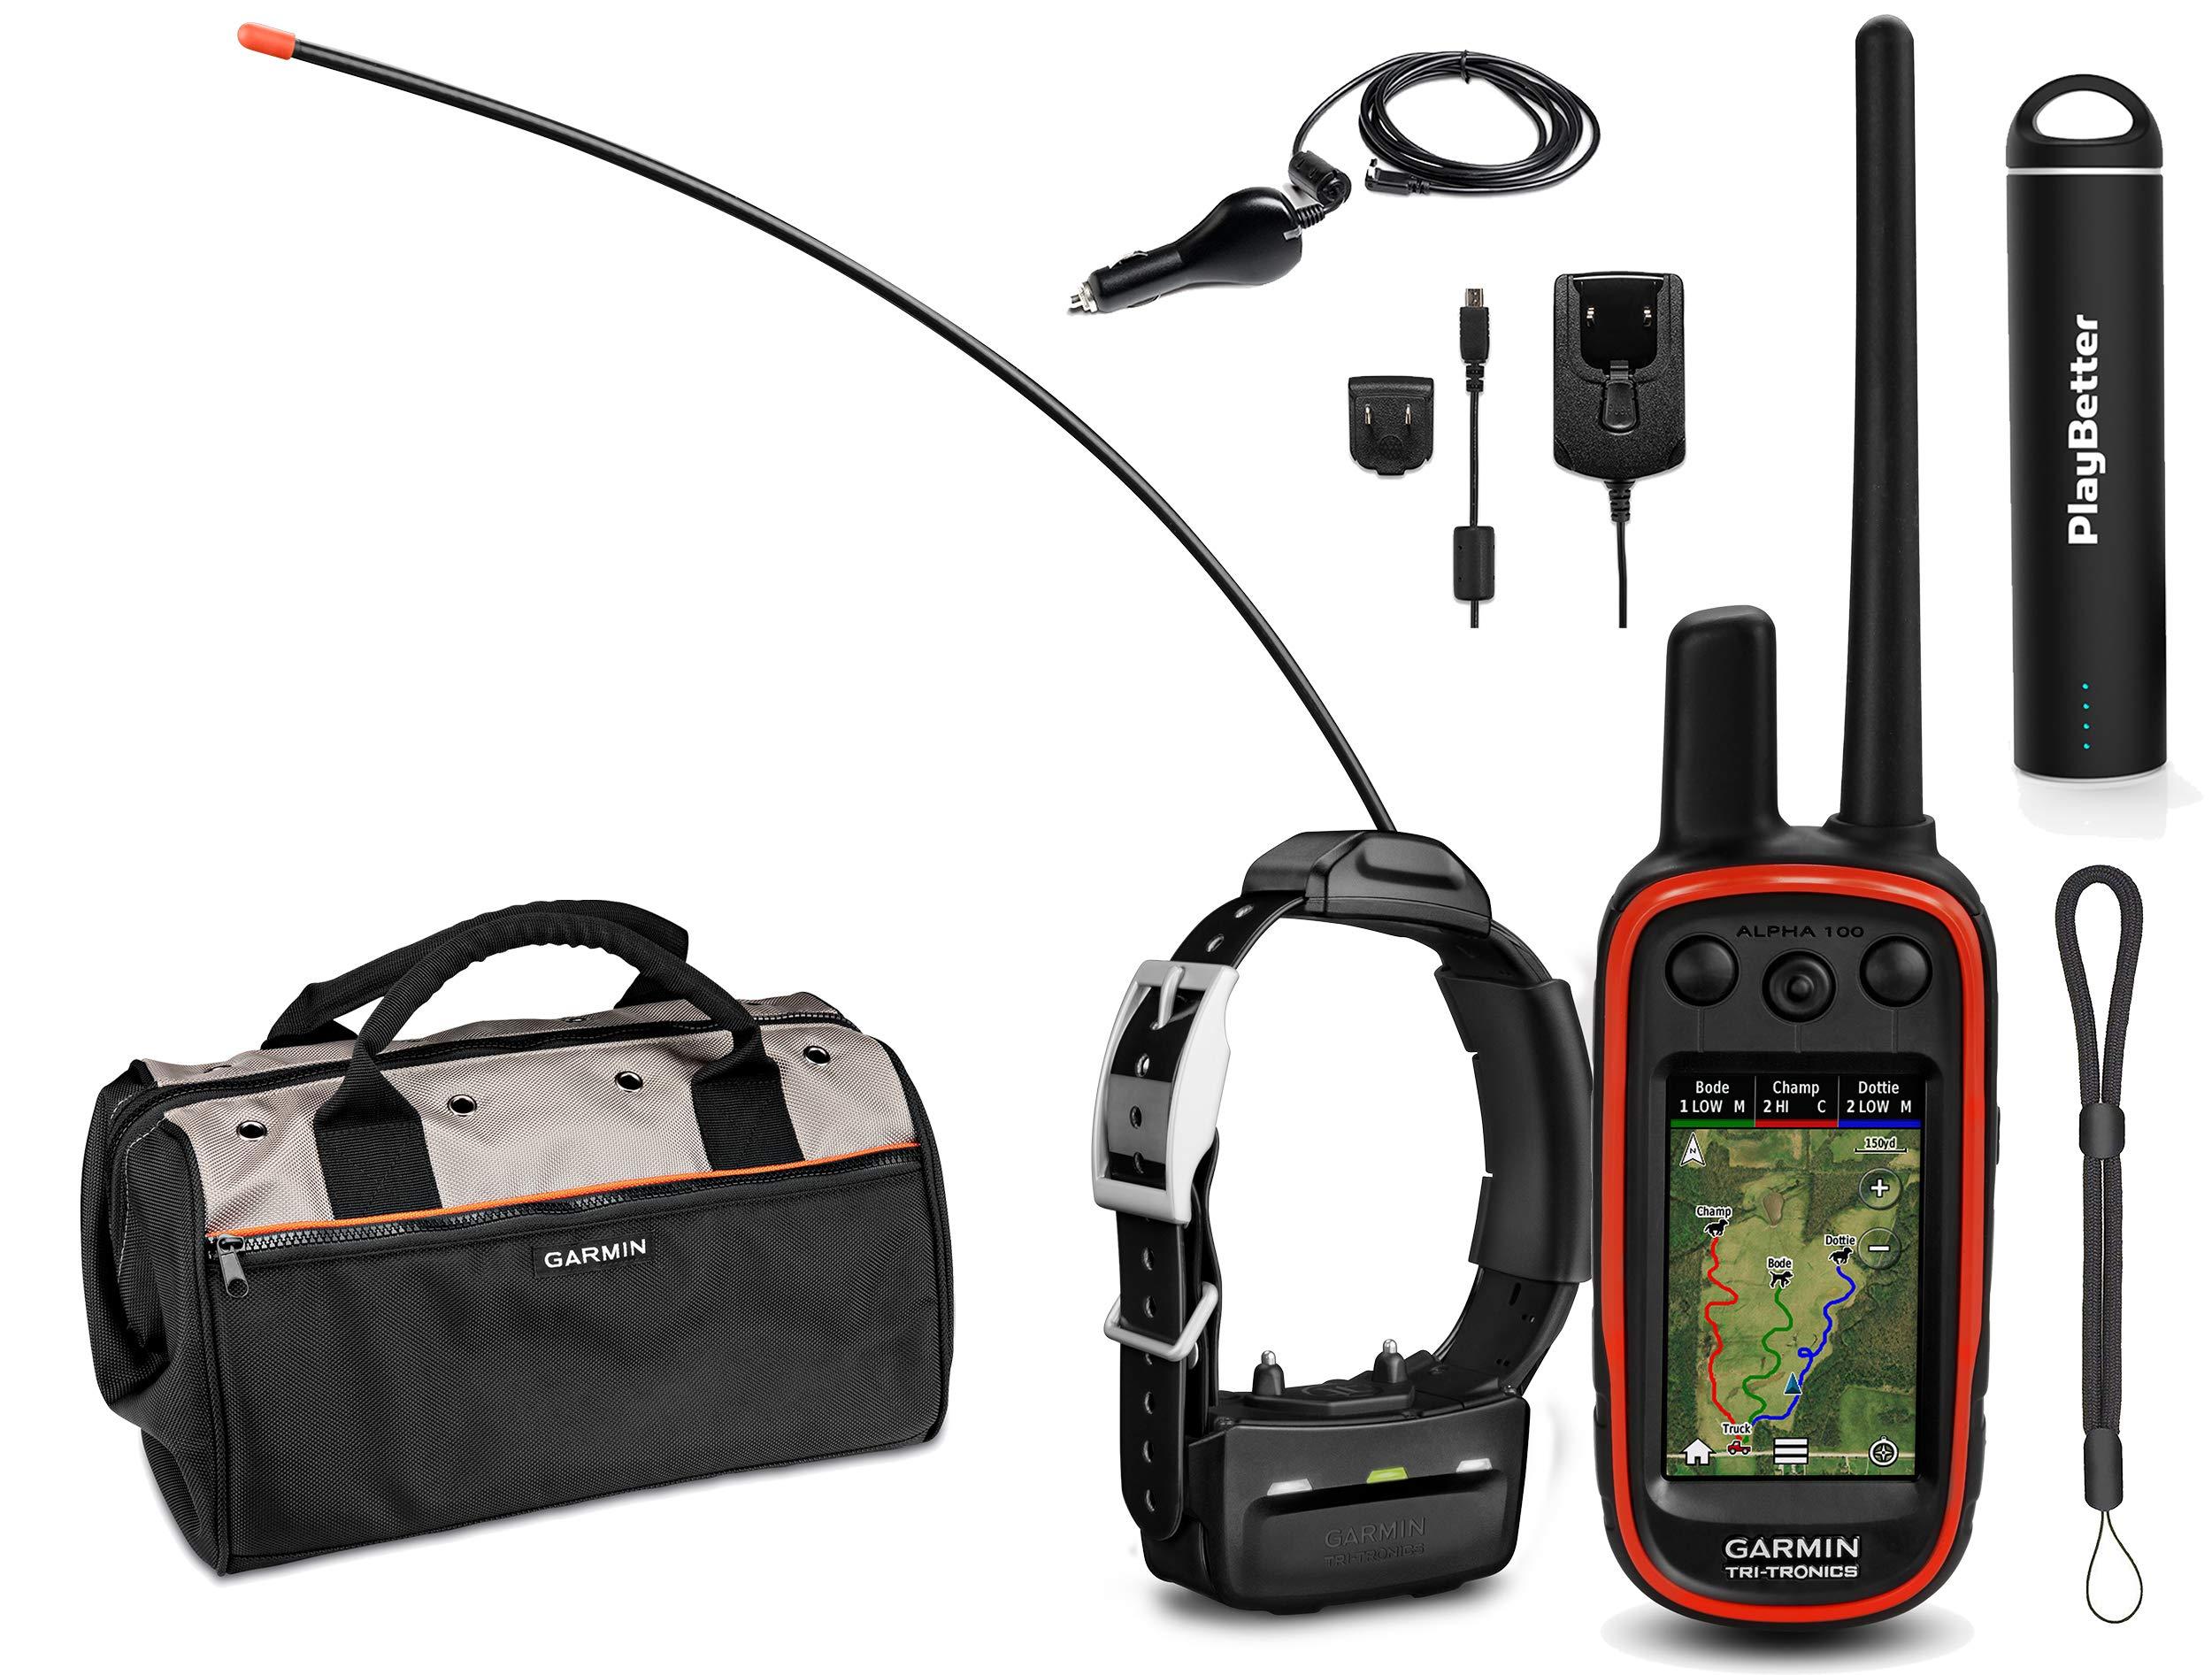 Garmin Alpha 100 TT15 Combo (1 Collar) HuntBetter Bundle w/ TT15 Dog GPS Collars, PlayBetter Portable Charger & Tether | Track & Train Dog GPS, Field Bag (Black) by PlayBetter